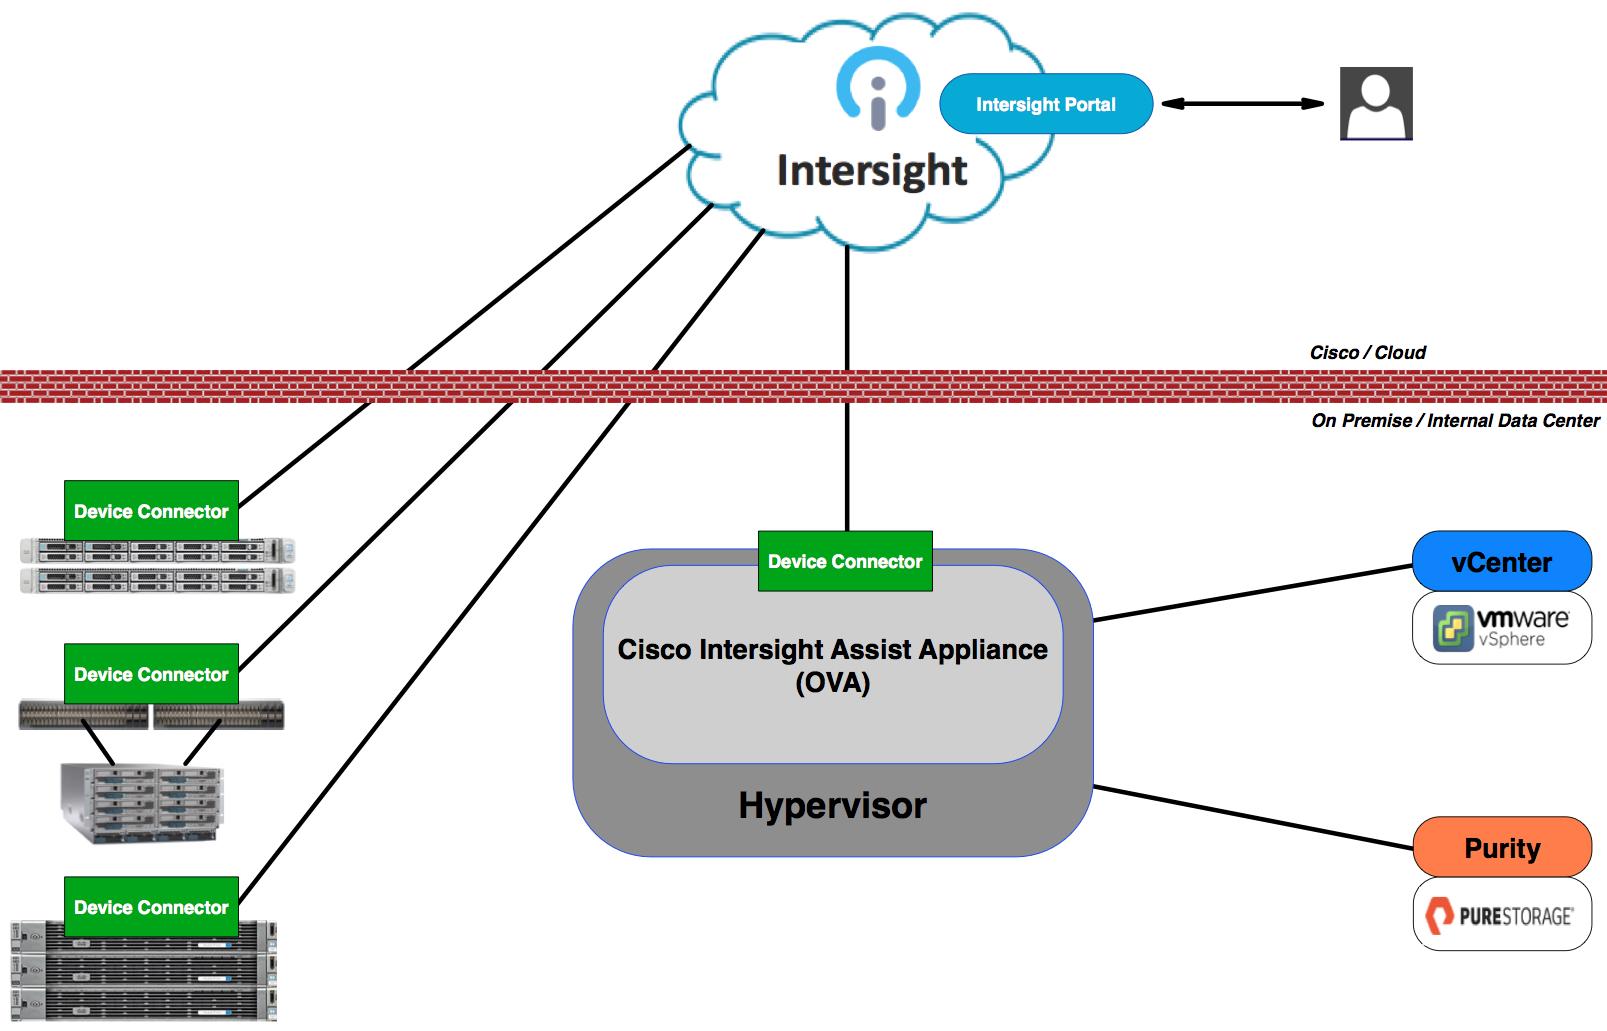 Cisco Intersight Assist Appliance